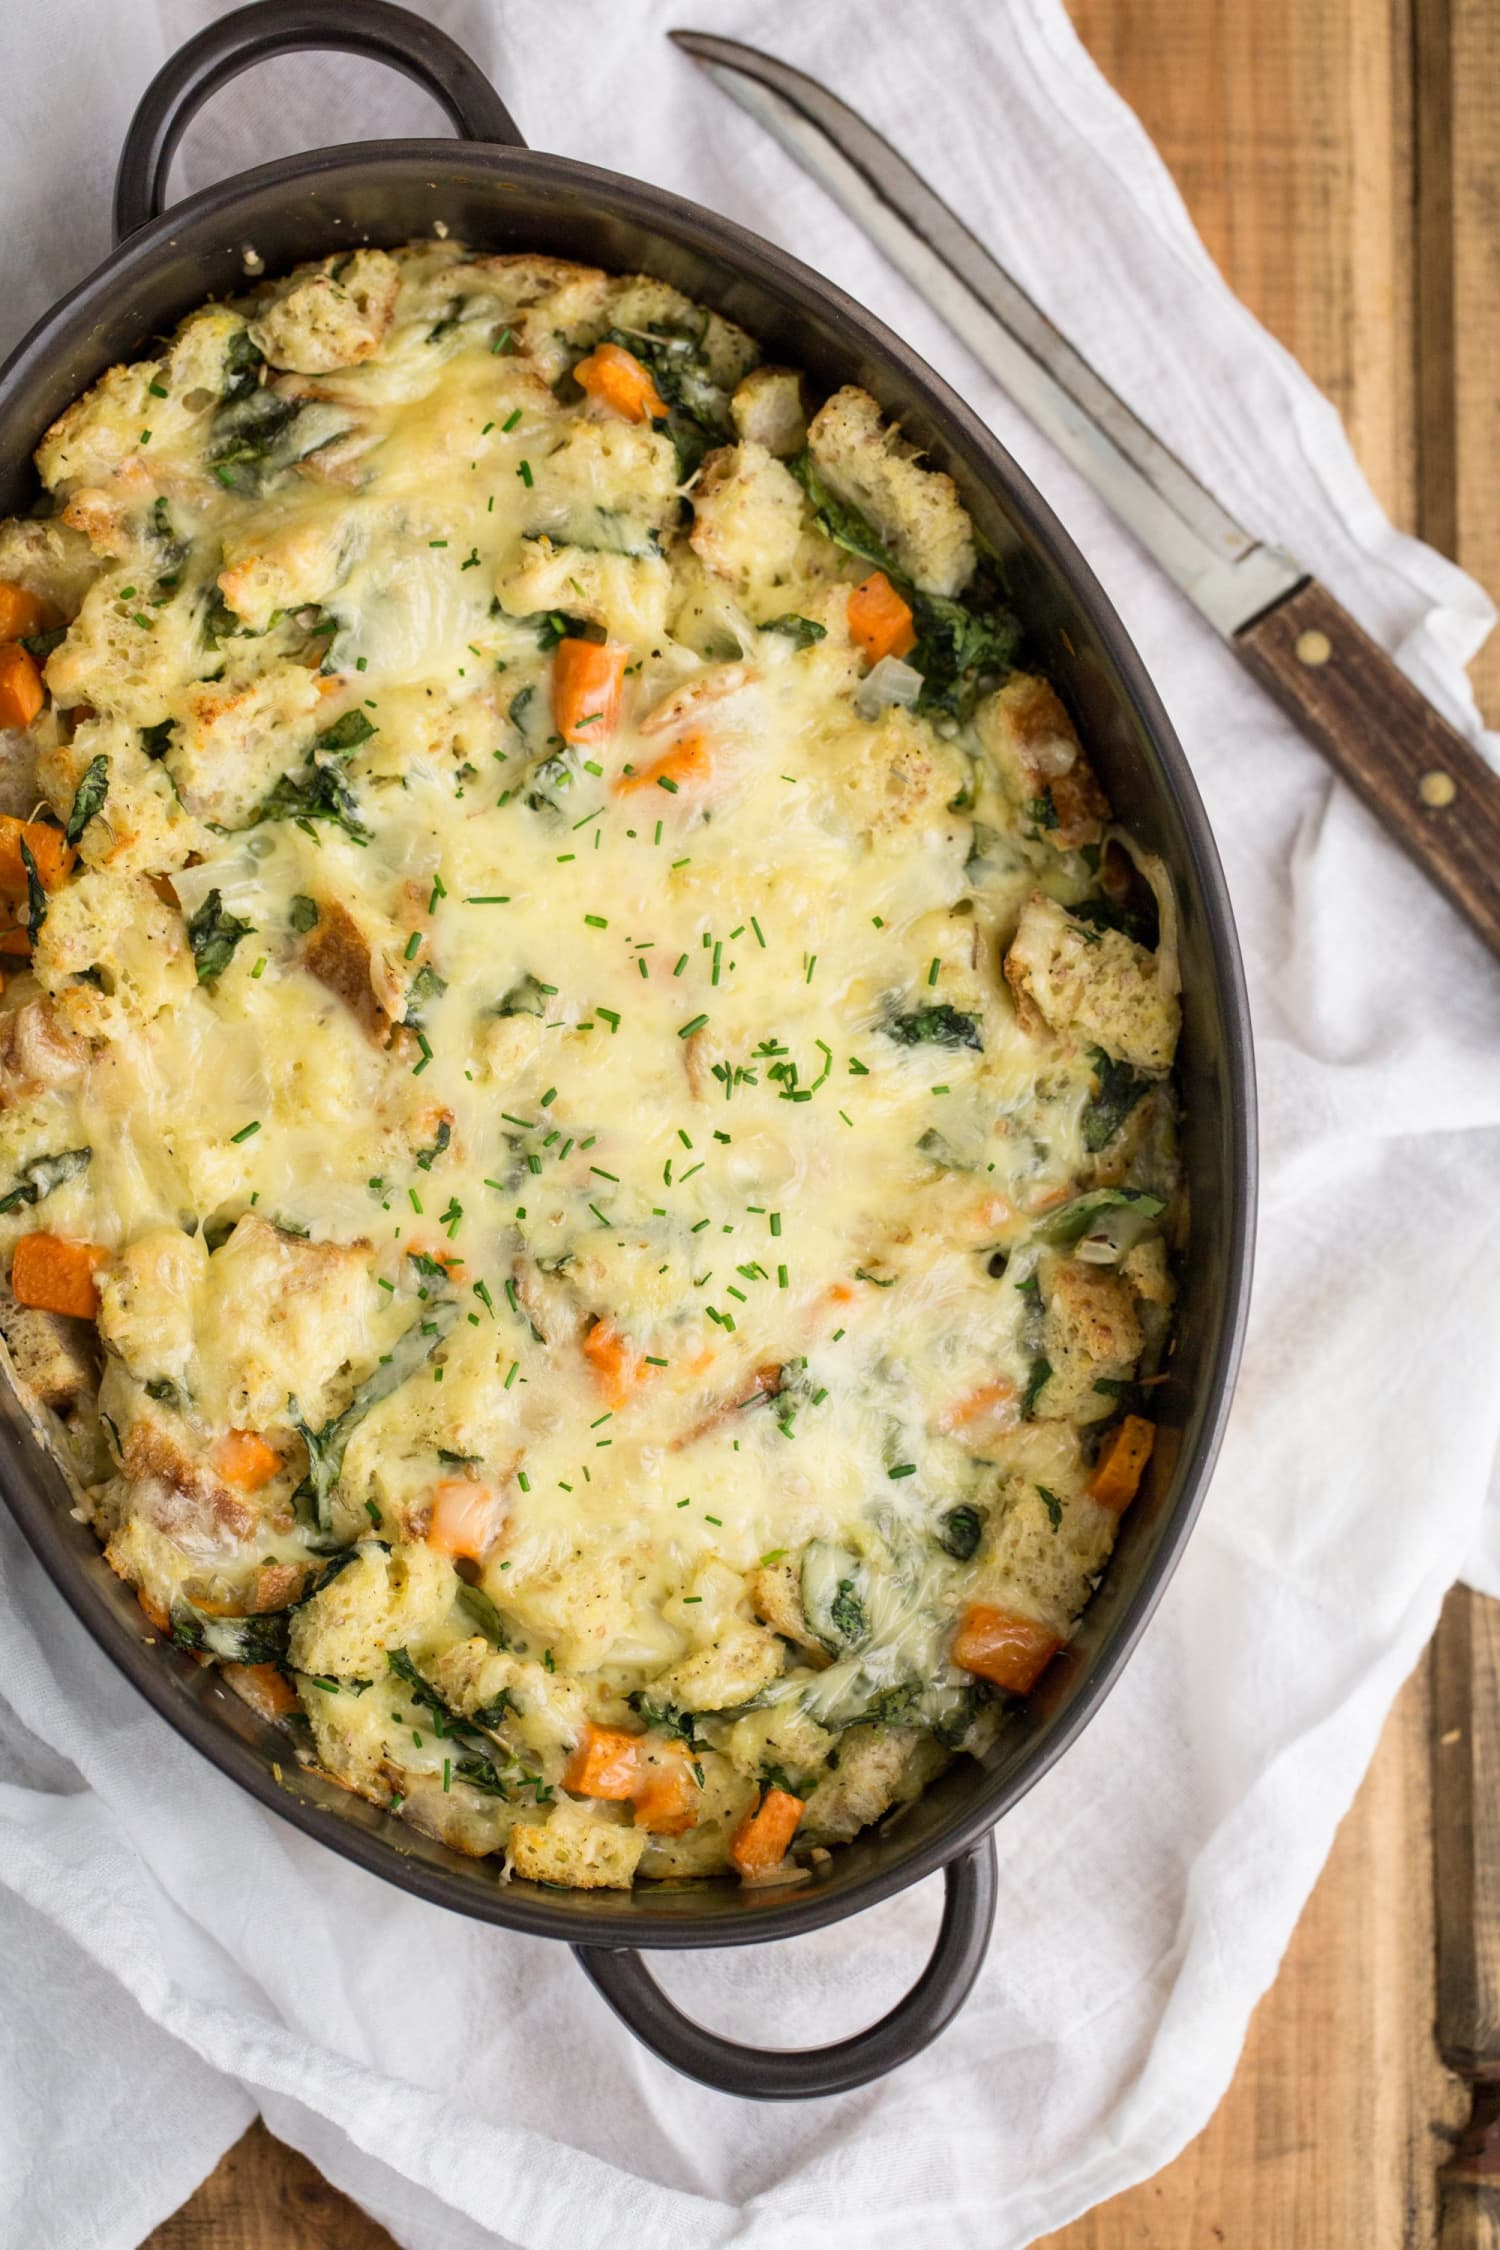 Recipe: Sweet Potato & Spinach Breakfast Strata